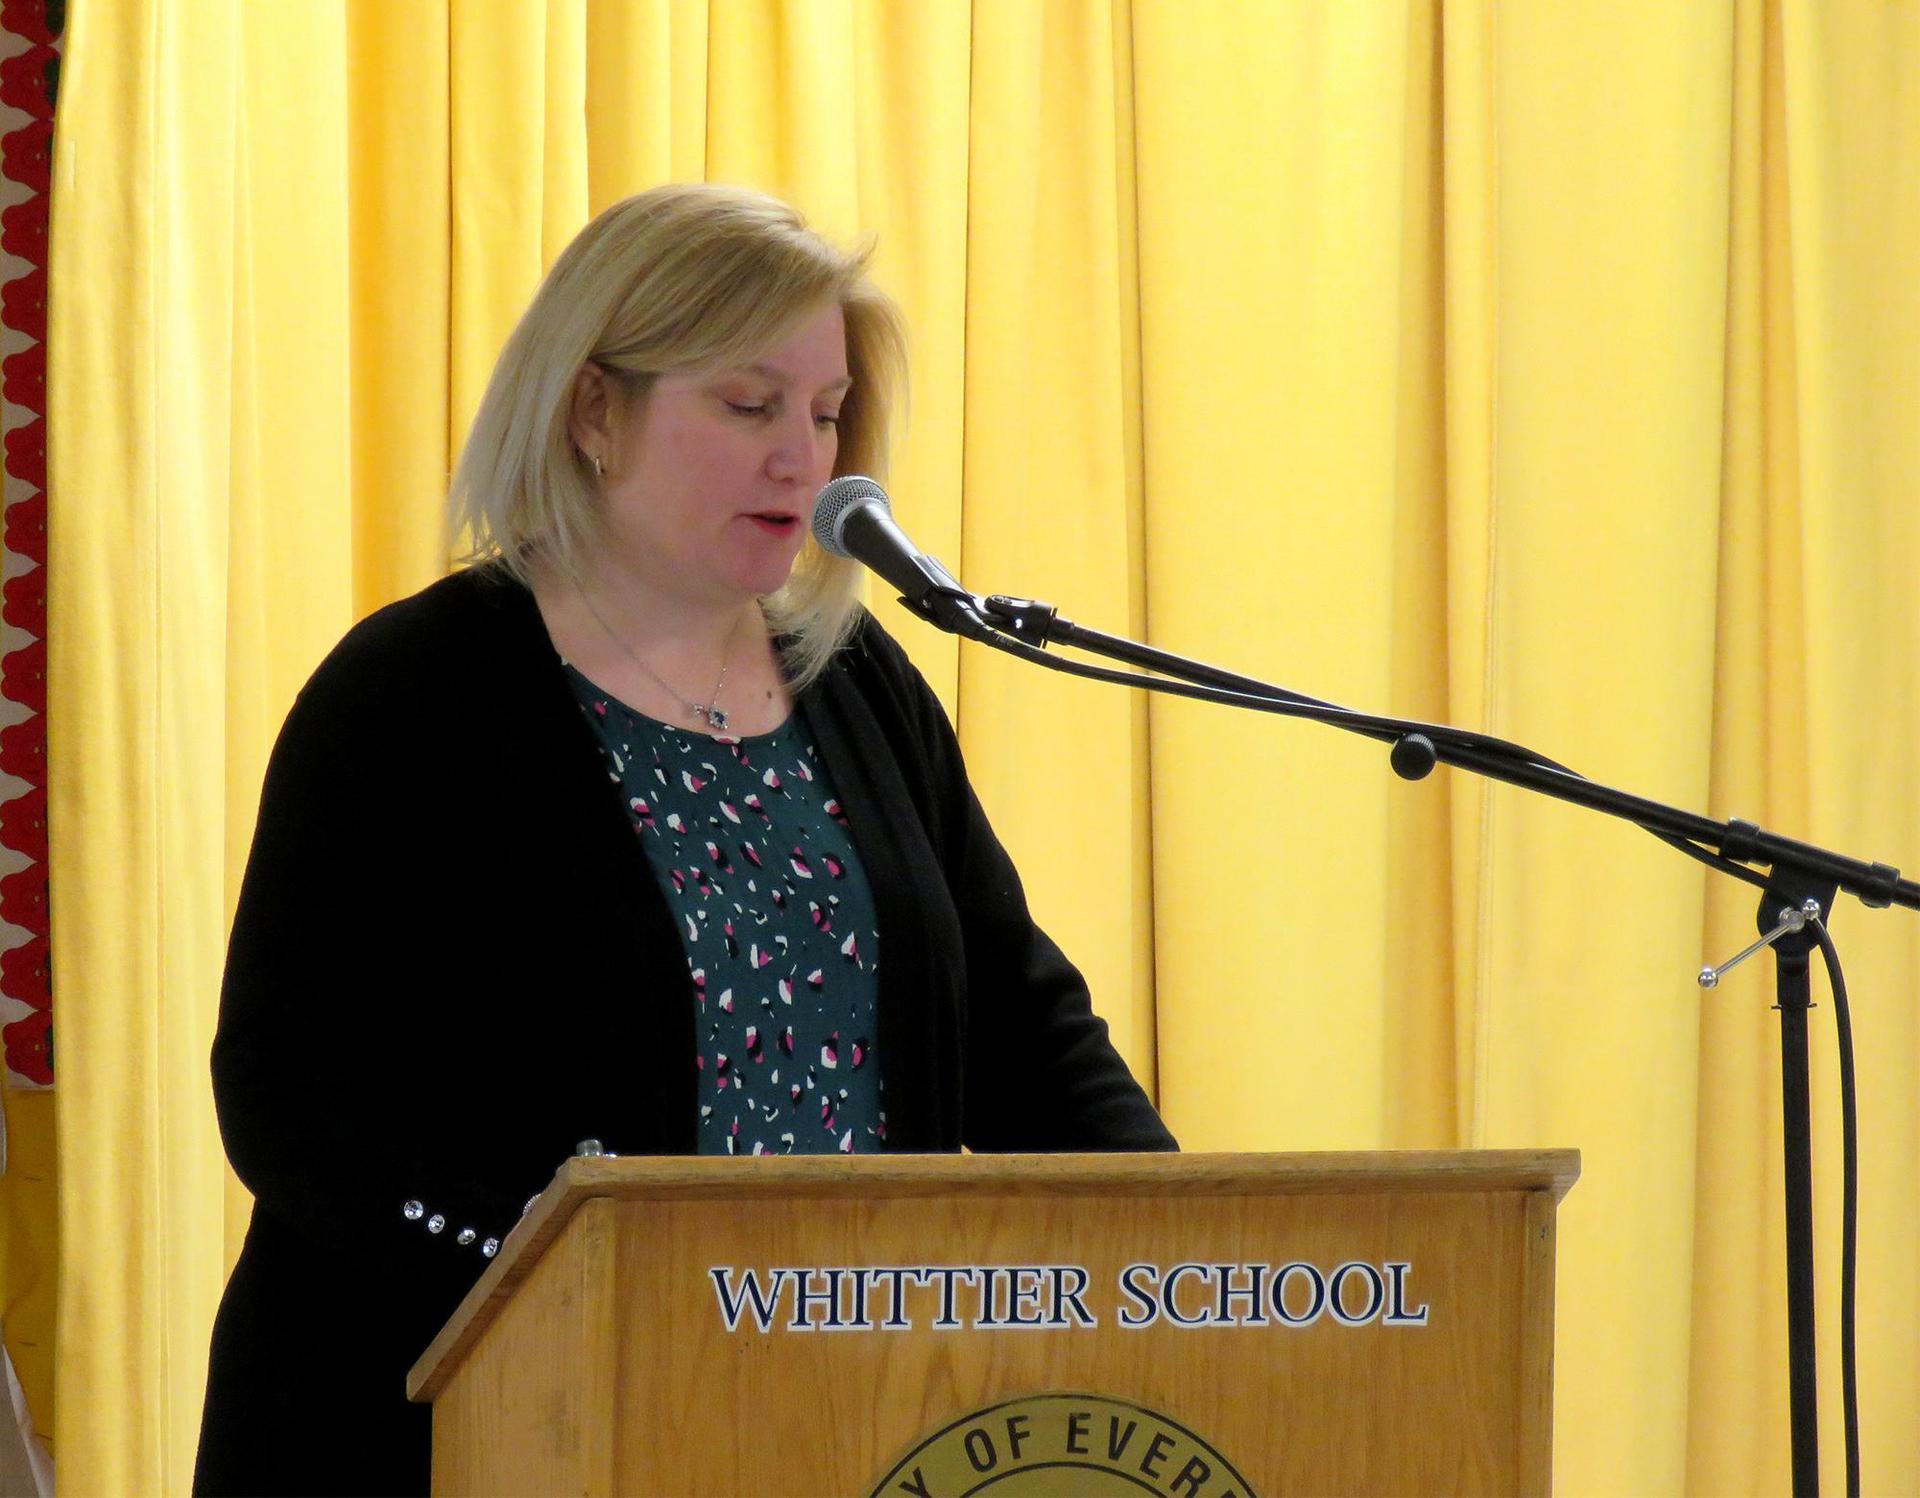 Host Lisa Norberg